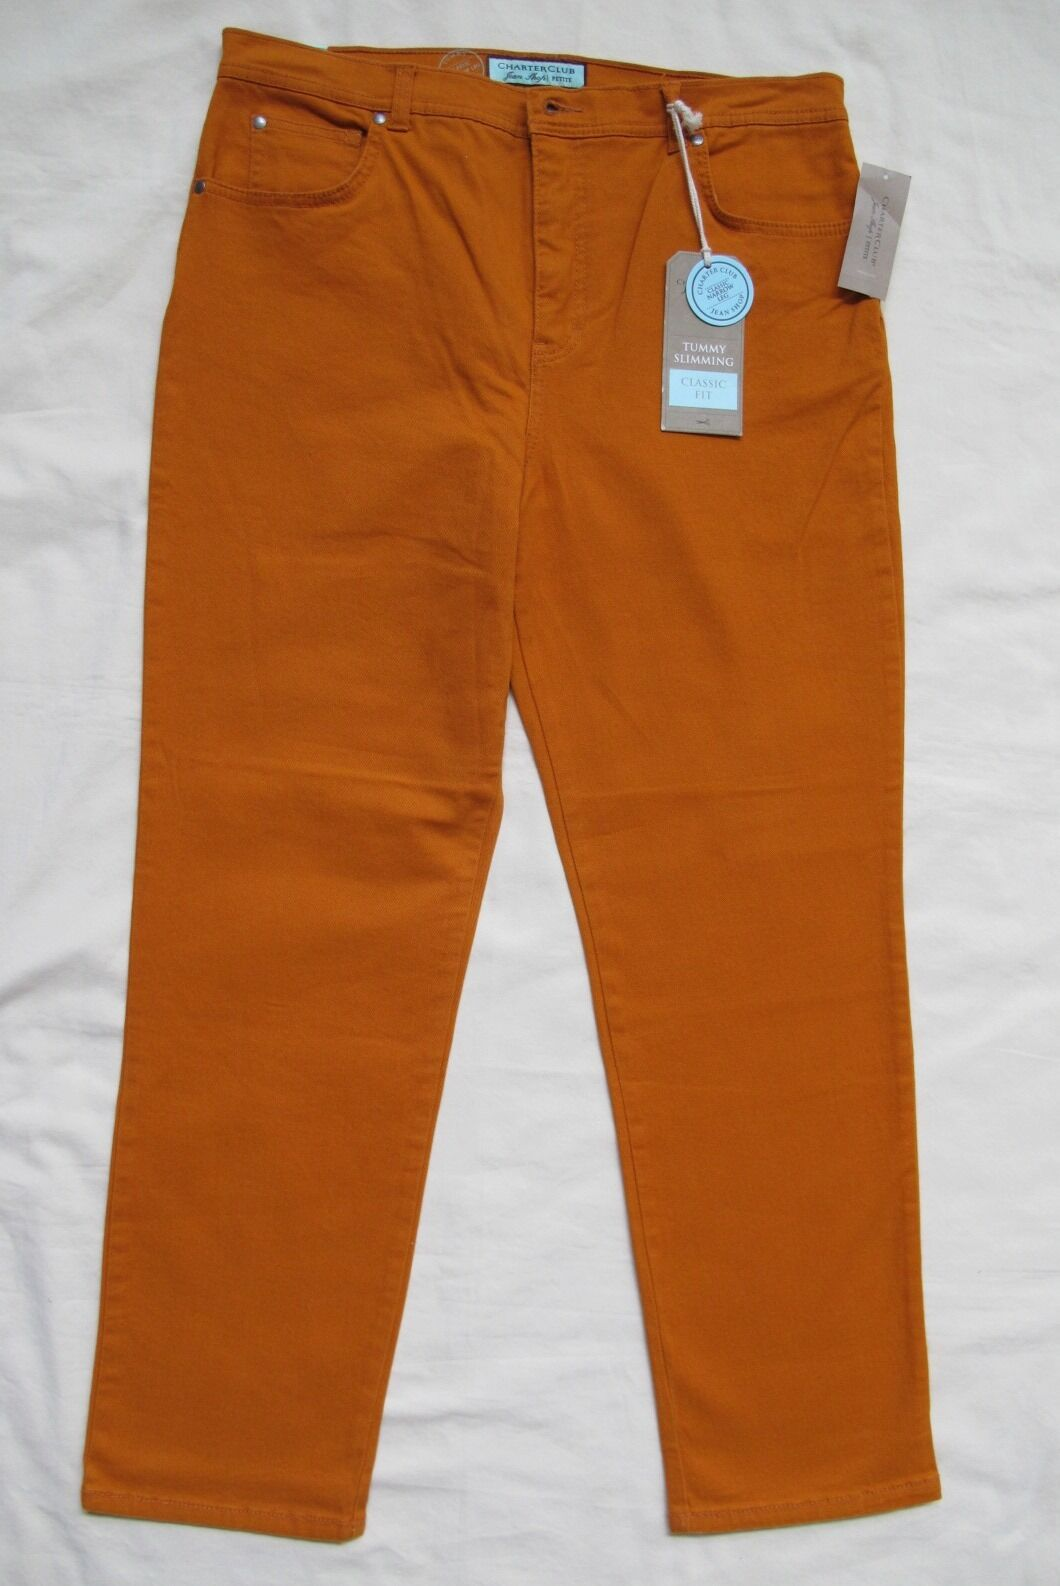 NWT Charter Club_Women's Jean Shop Tummy Slim Classic Fit Narrow Leg (14P)